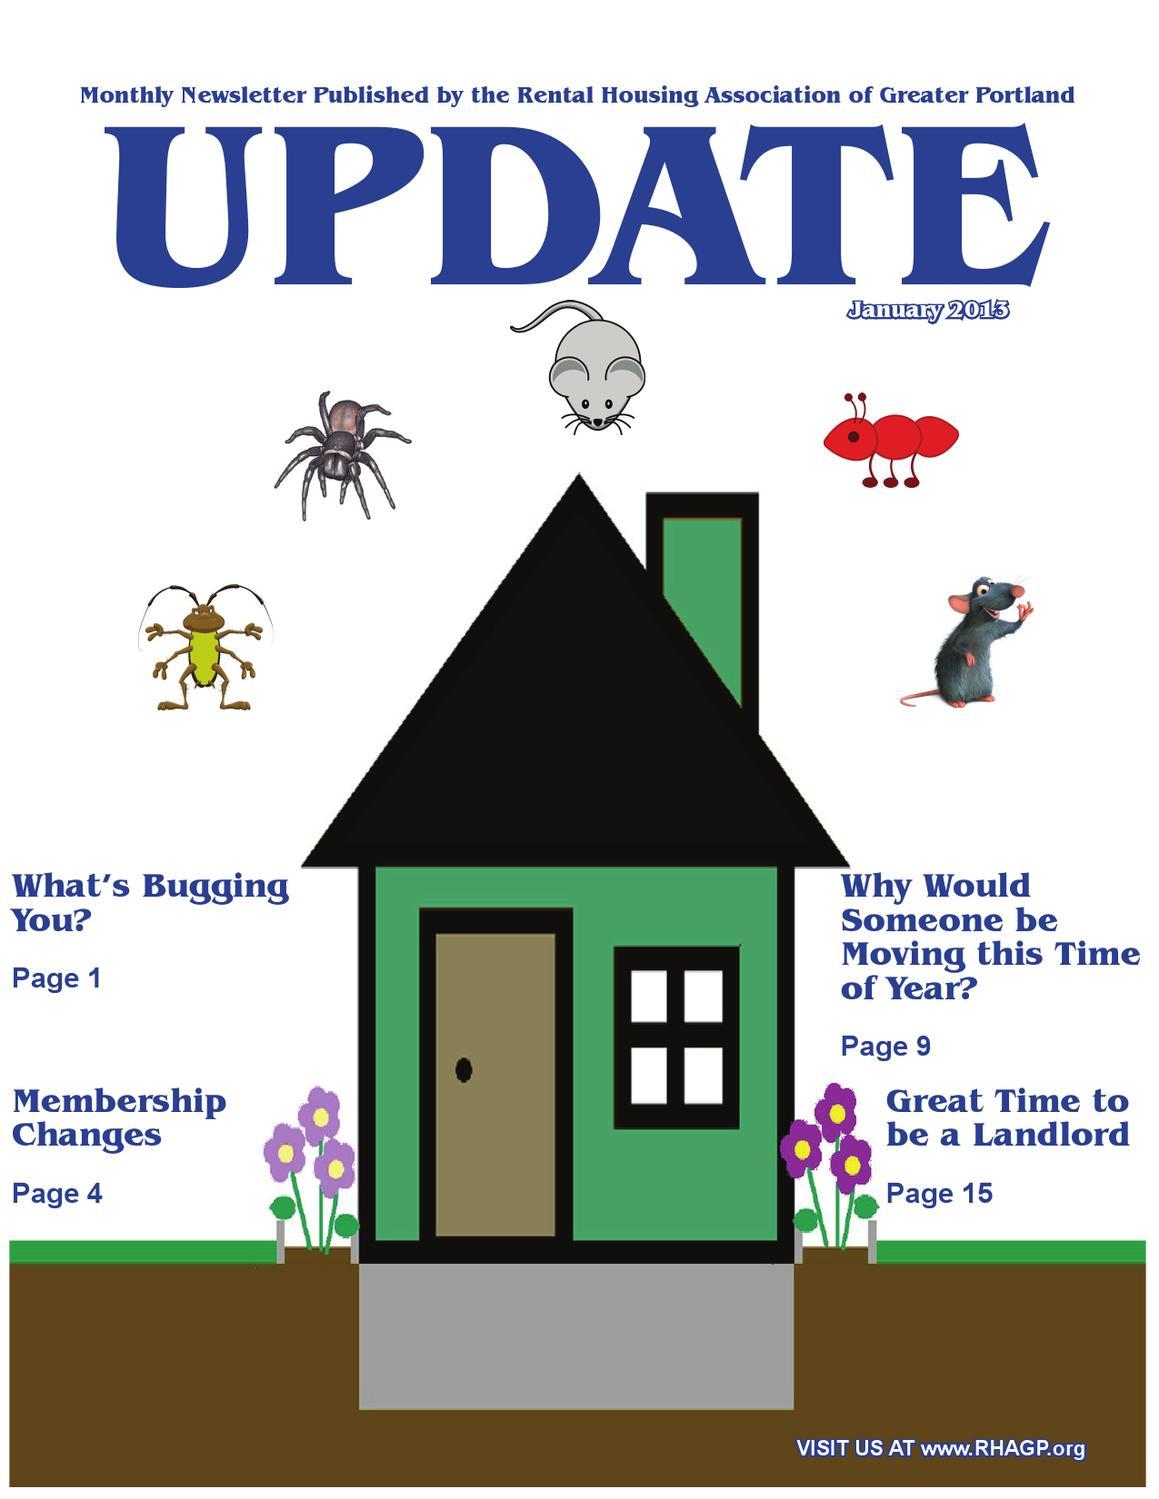 January 2013 RHA Newsletter by Cari Pierce - issuu